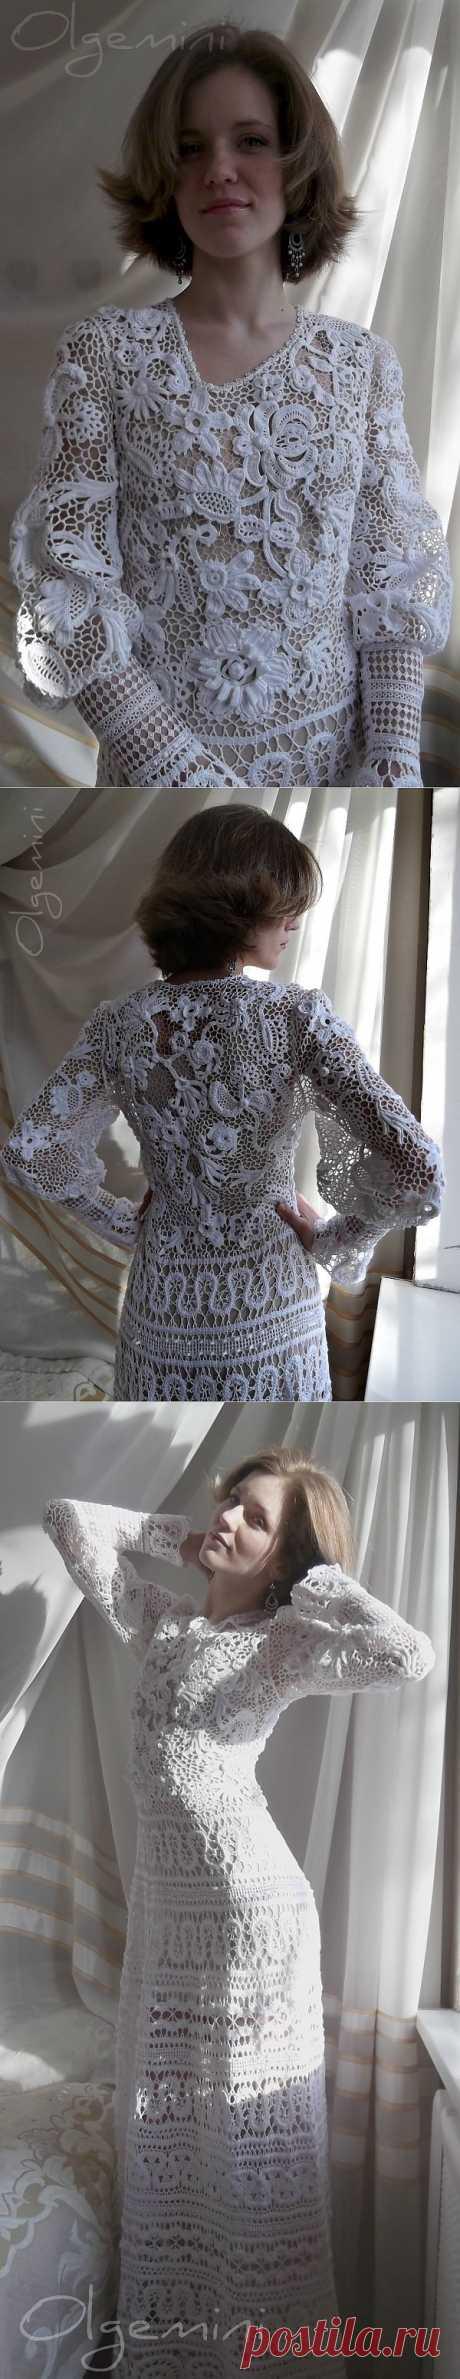 "Платье""Лебедушка"". ¡La belleza indescriptible!!!. El encaje irlandés + bryugskoe el encaje = el vestido ""ЛЕБЁДУШКА"" de OLGEMINI... poshagovye la foto..."